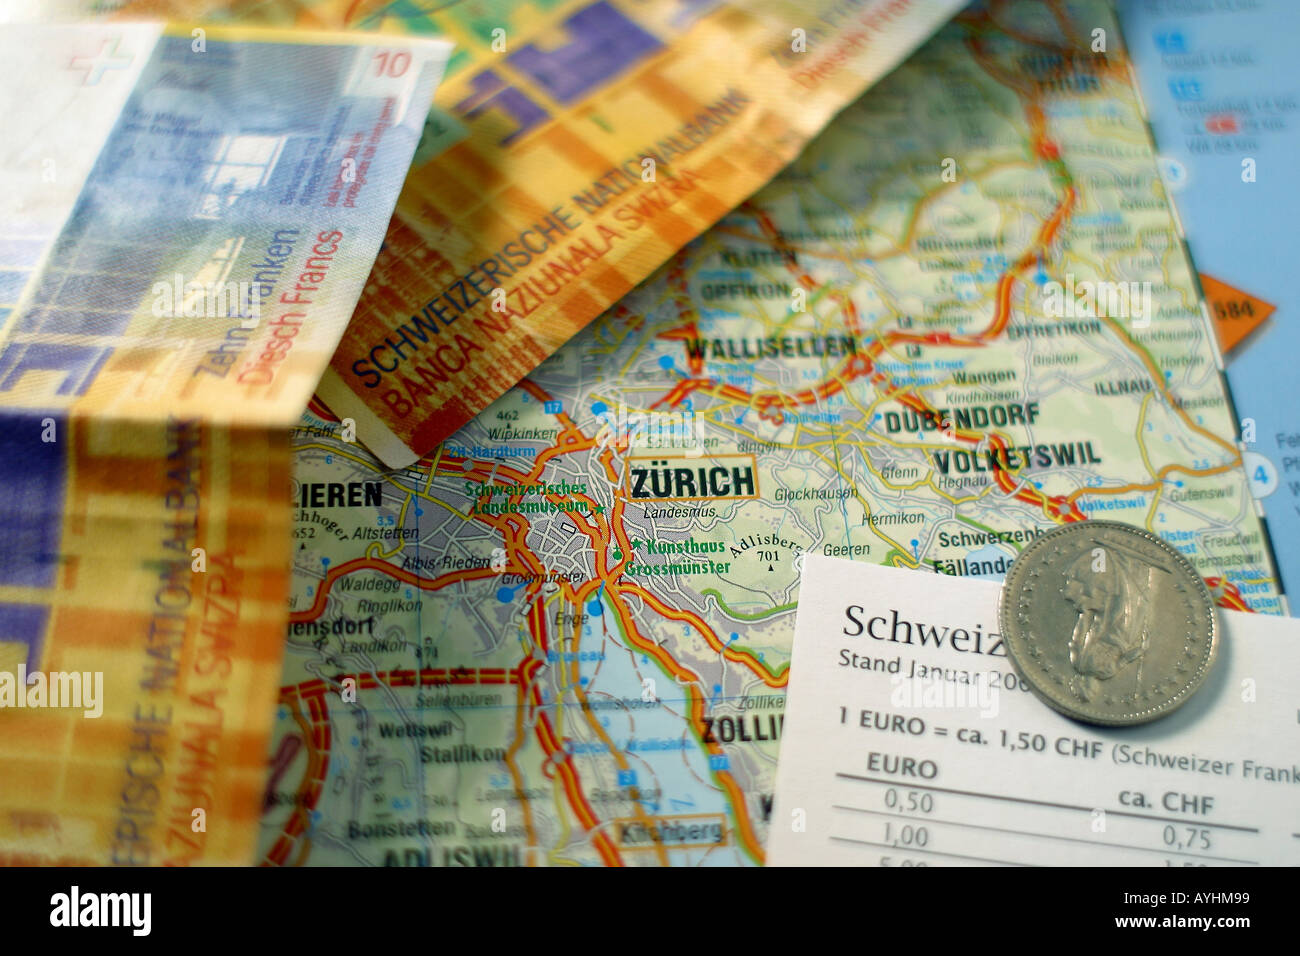 Schweizer Franken Stock Photos Schweizer Franken Stock Images